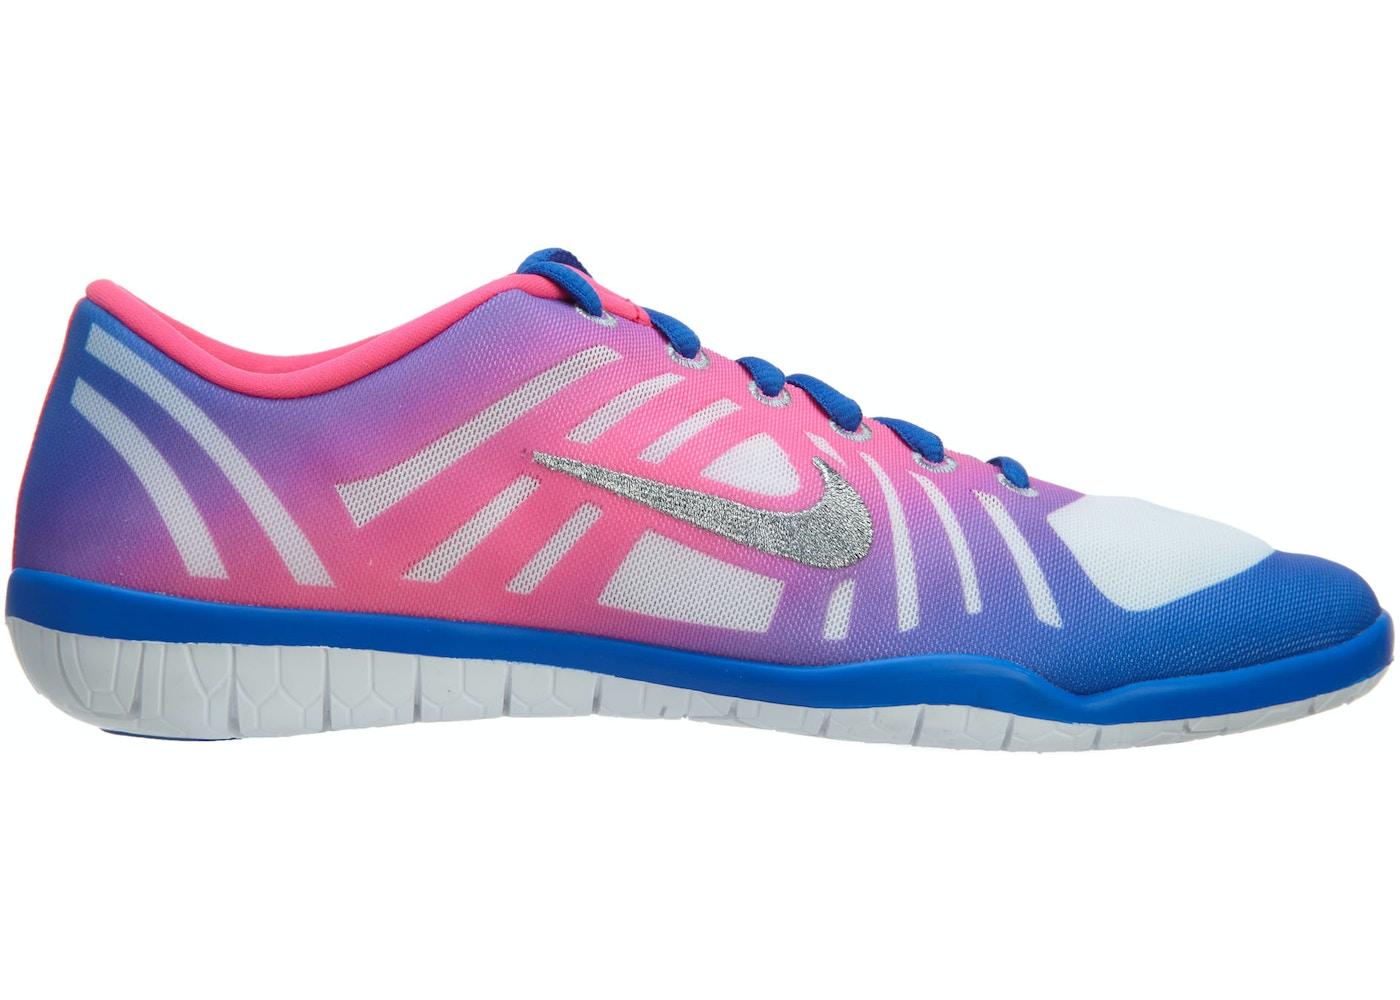 f598a613fba9 Nike Free 3.0 Studio Dance P Hyper Cobalt Metallic Silver-Hyper Pink ...